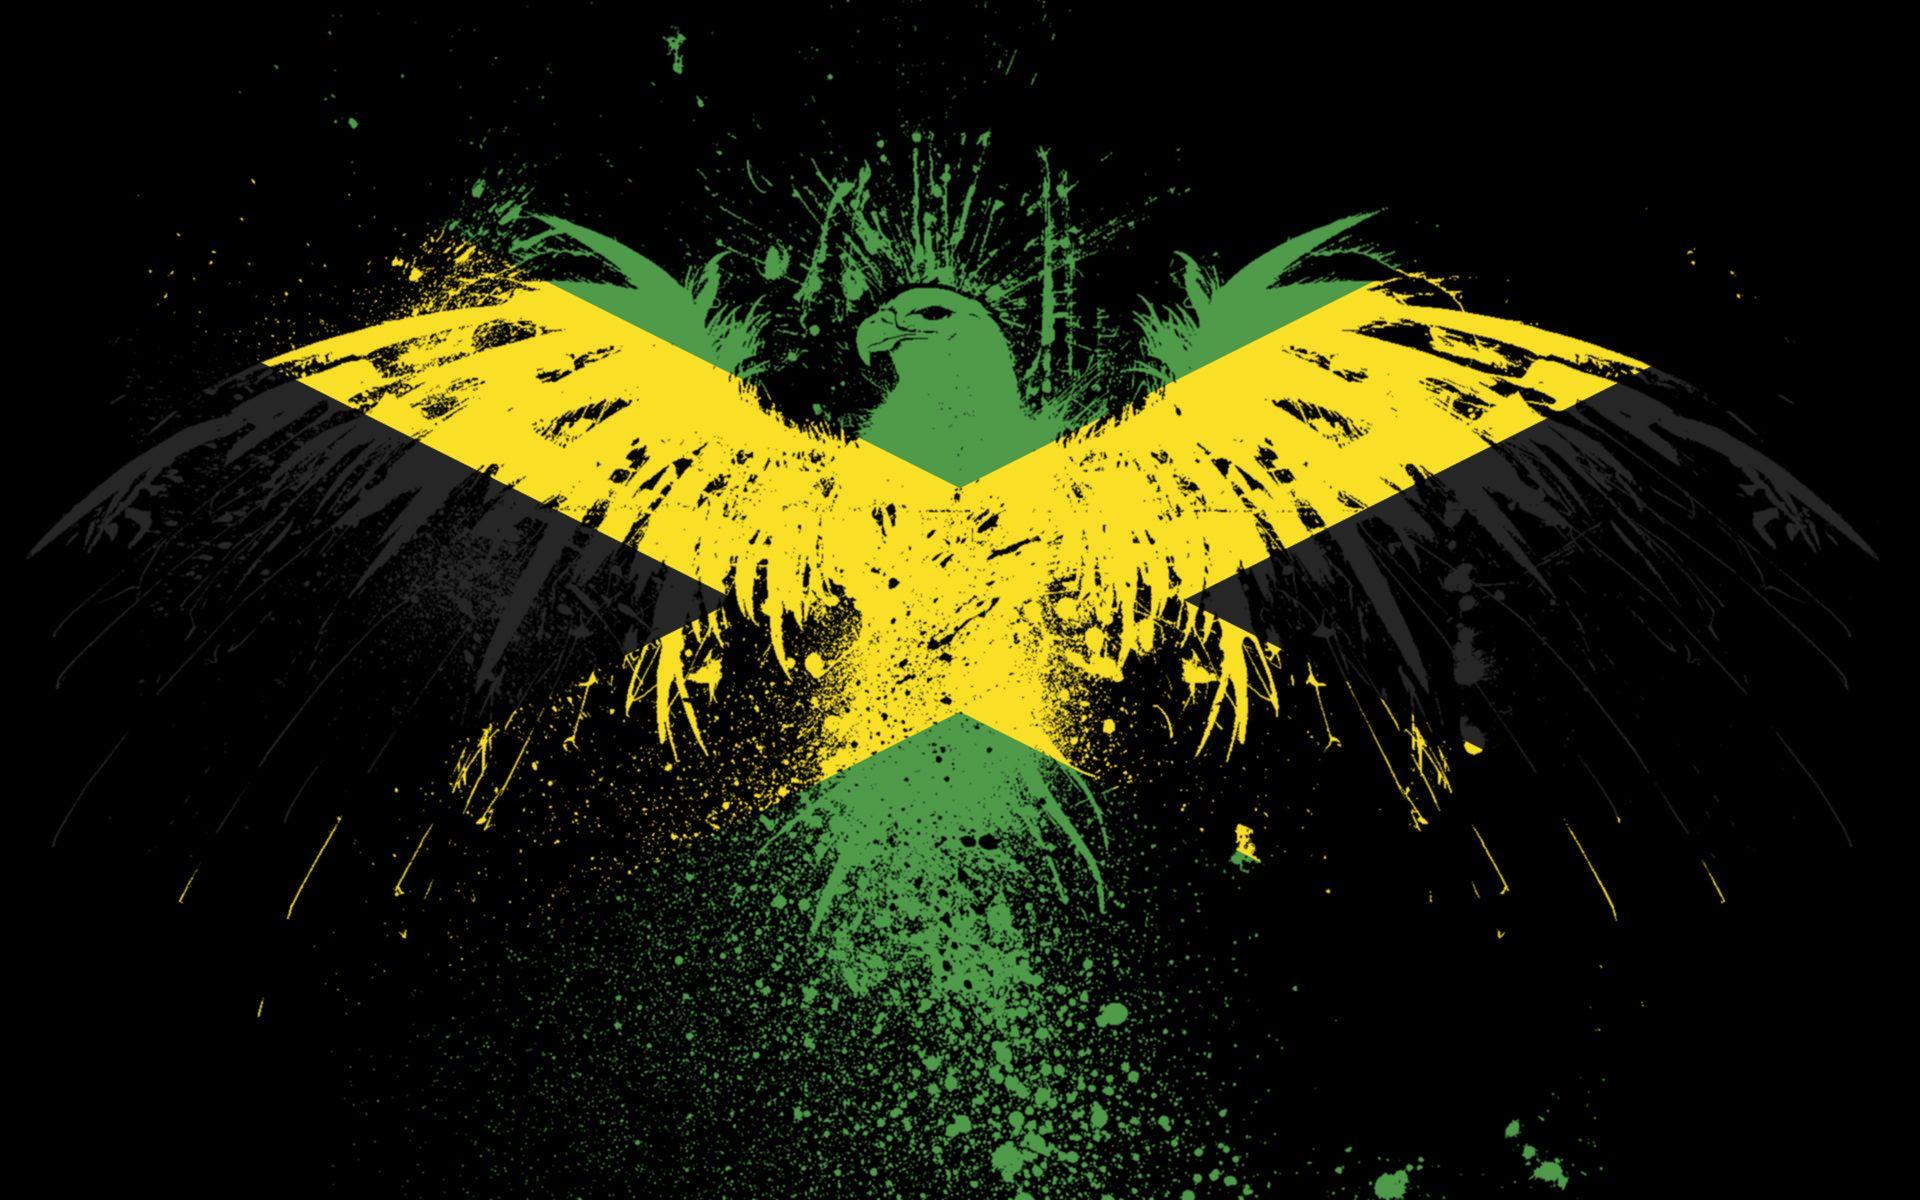 Awesome Jamaica Free Download Image Jamaica Flag Iphone Wallpaper Jamaica Flag Image